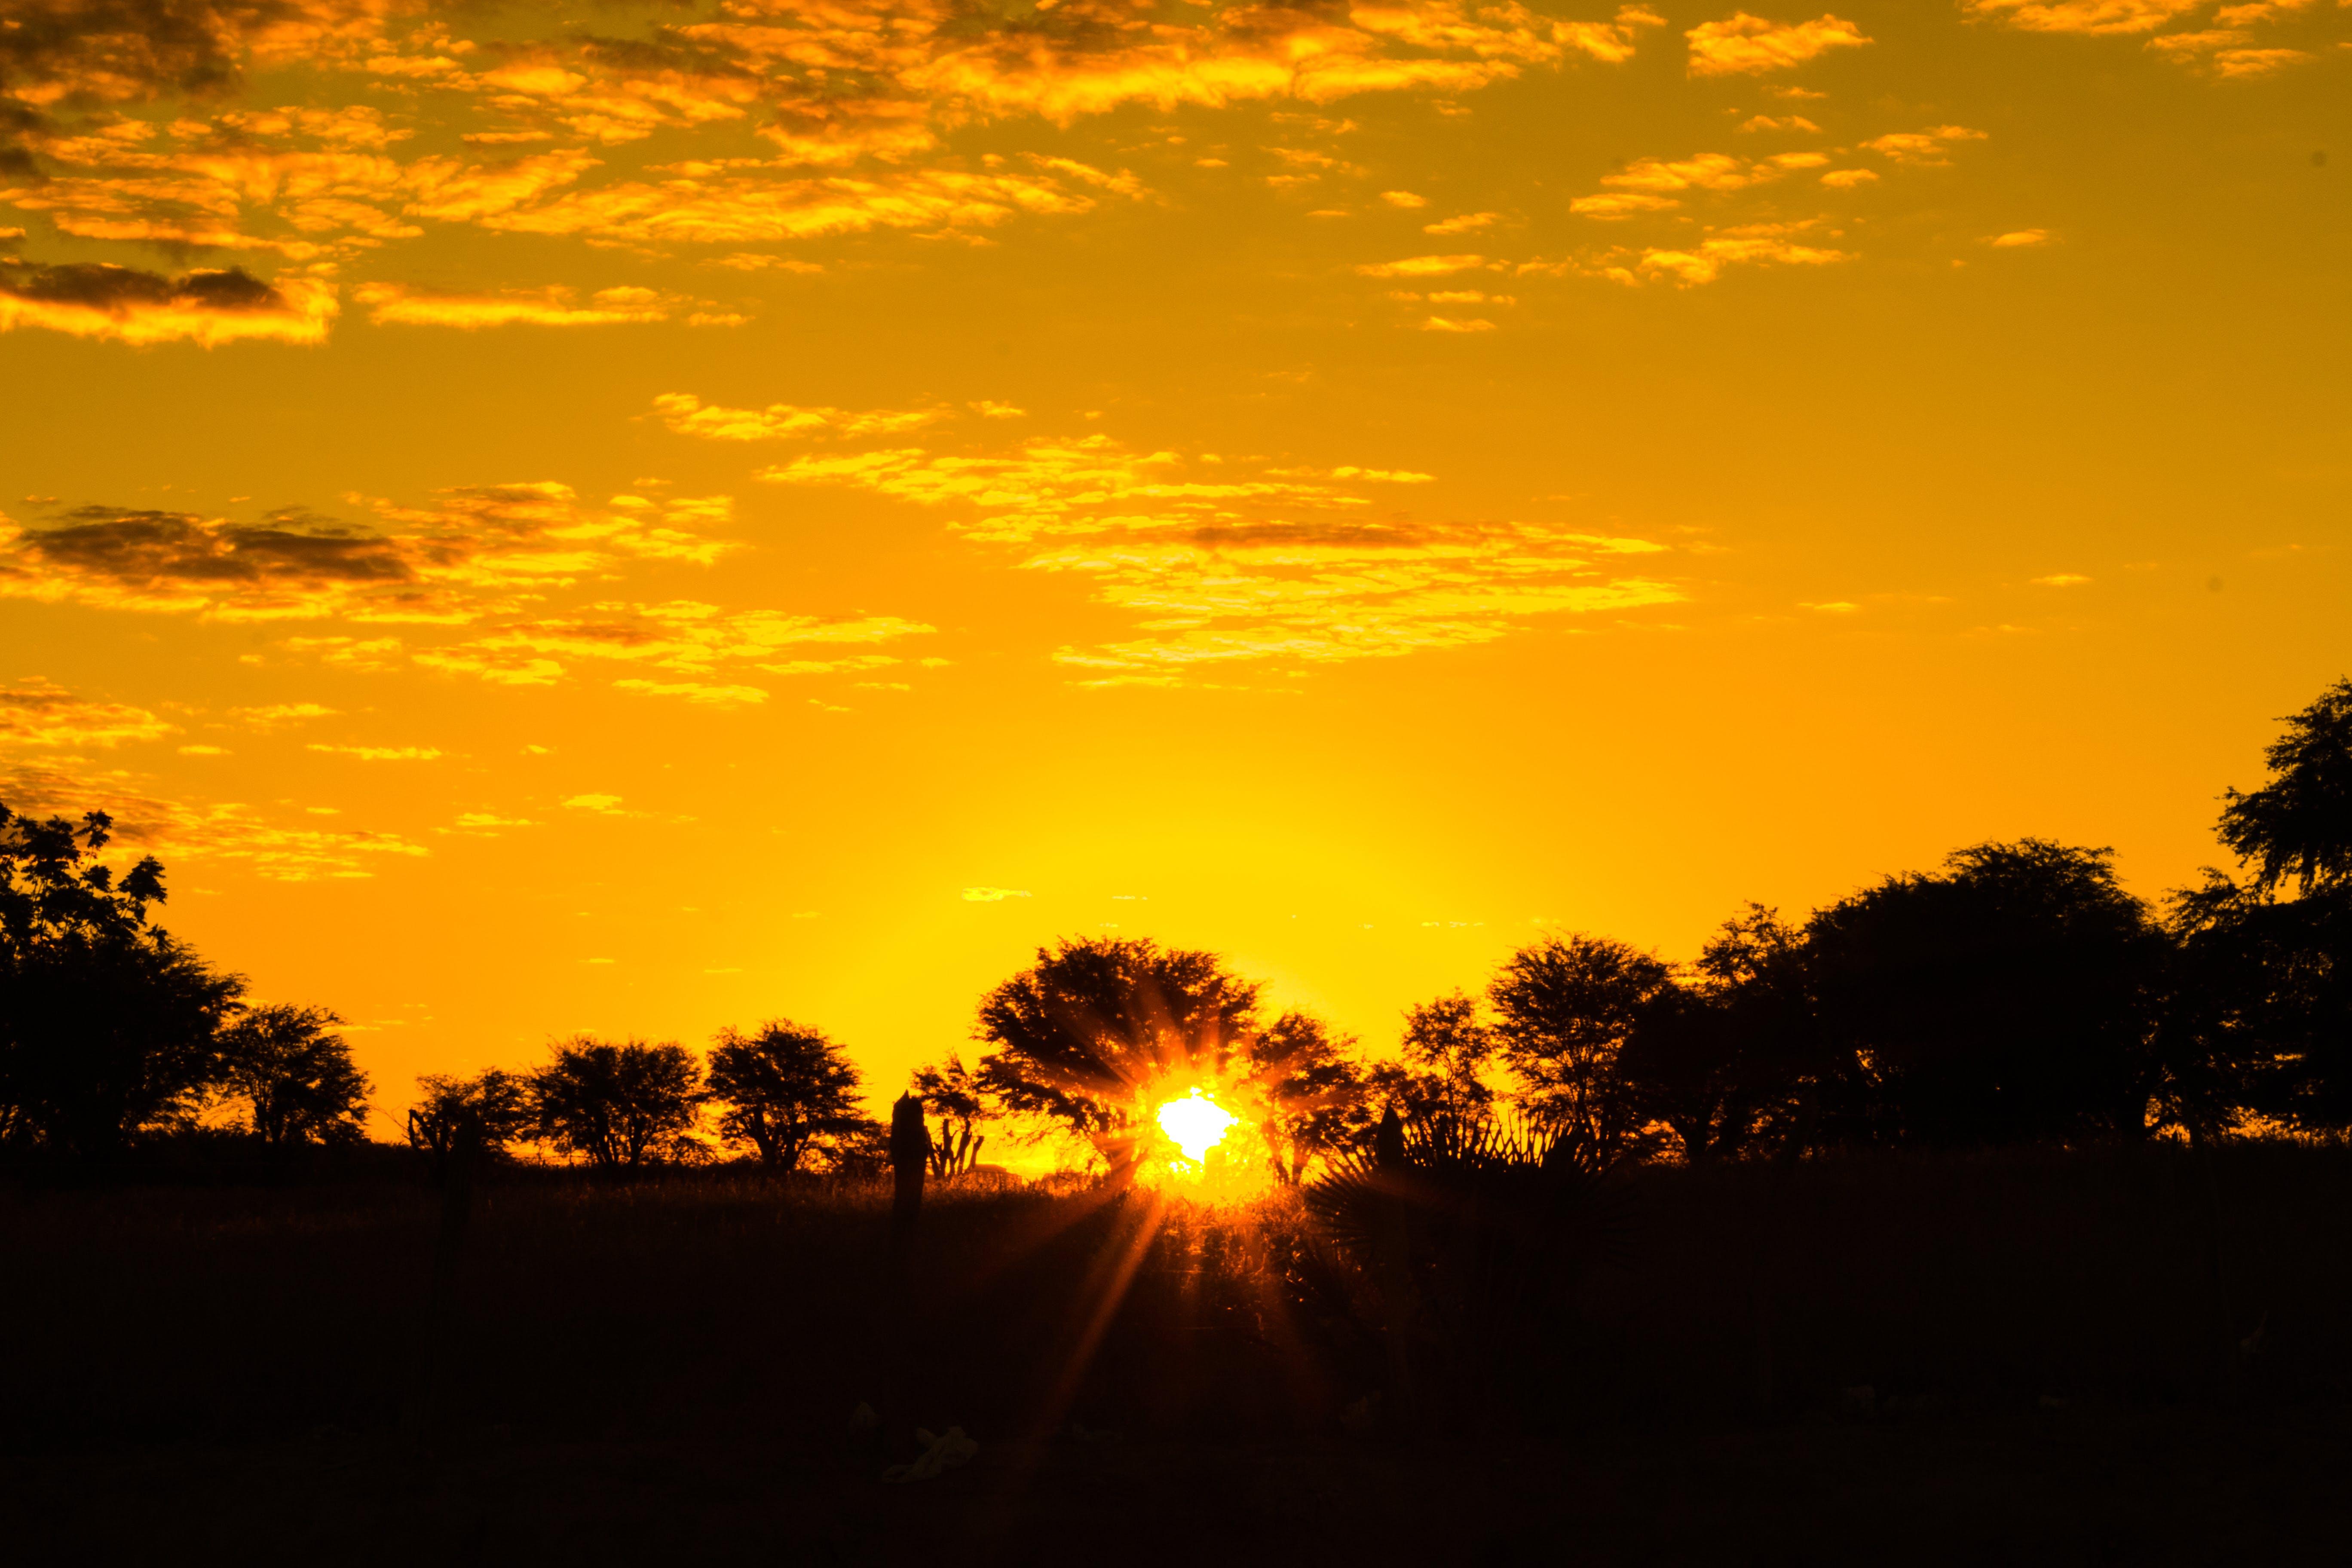 Free stock photo of #nature, evening sun, golden sun